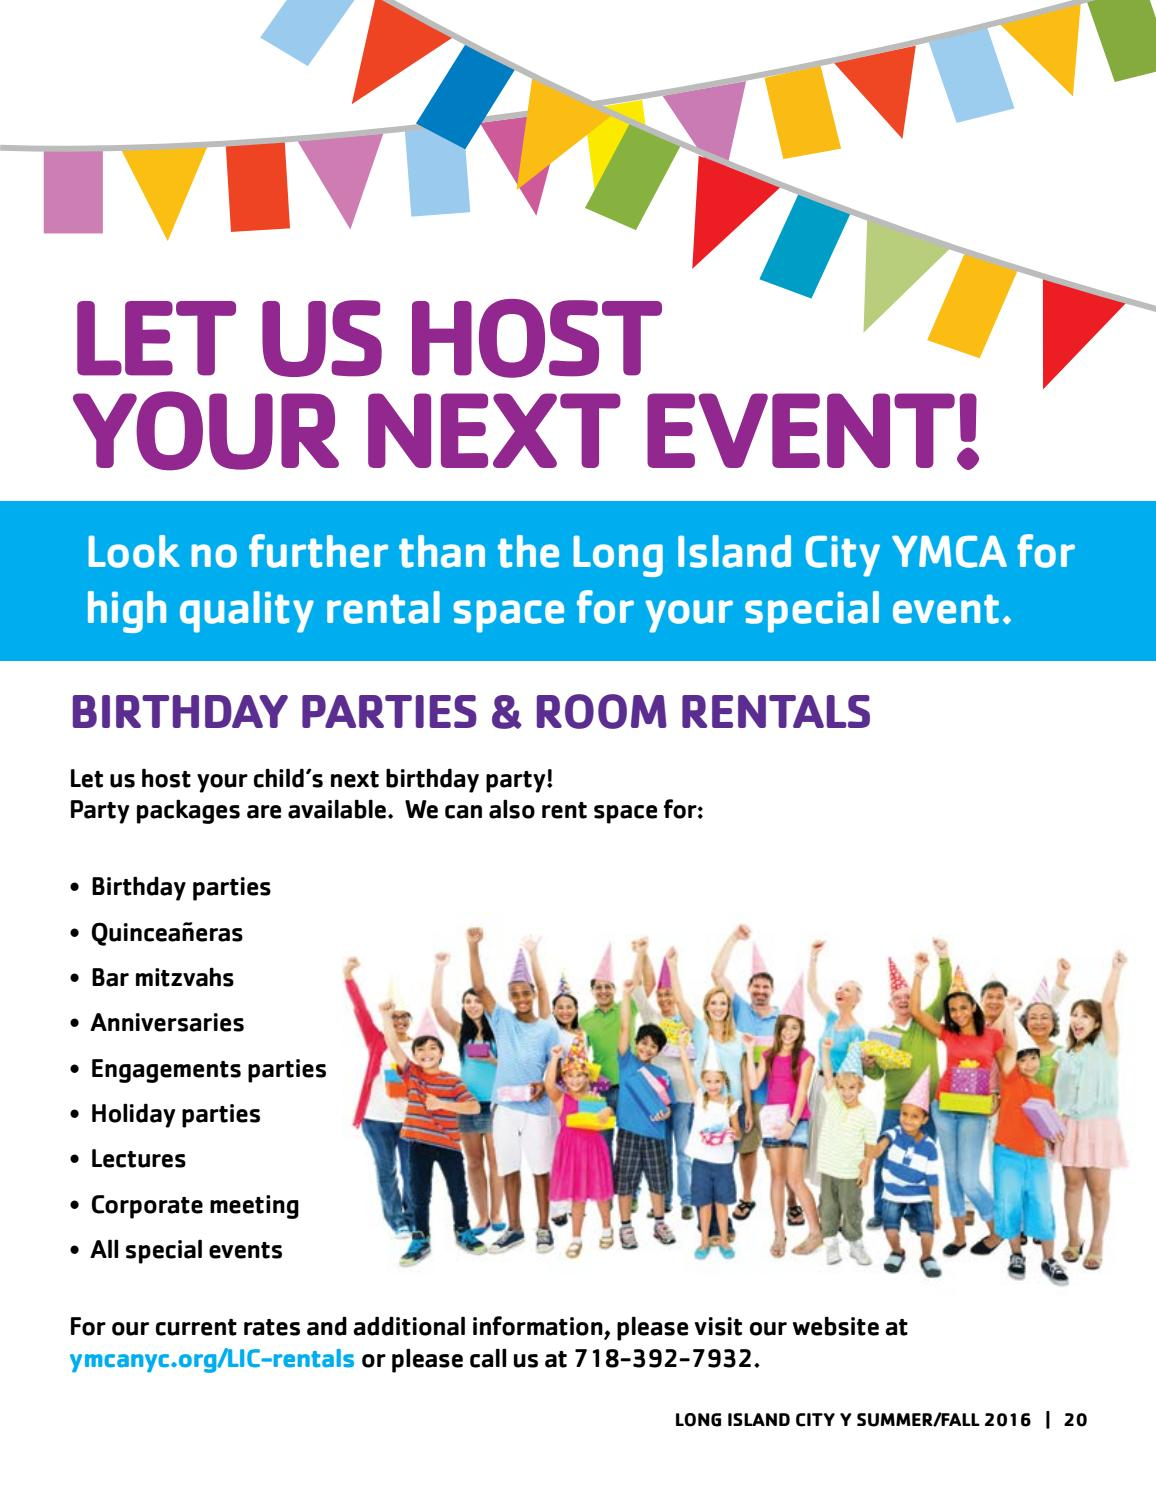 Long Island City Fall 16 PG by New York City's YMCA - issuu